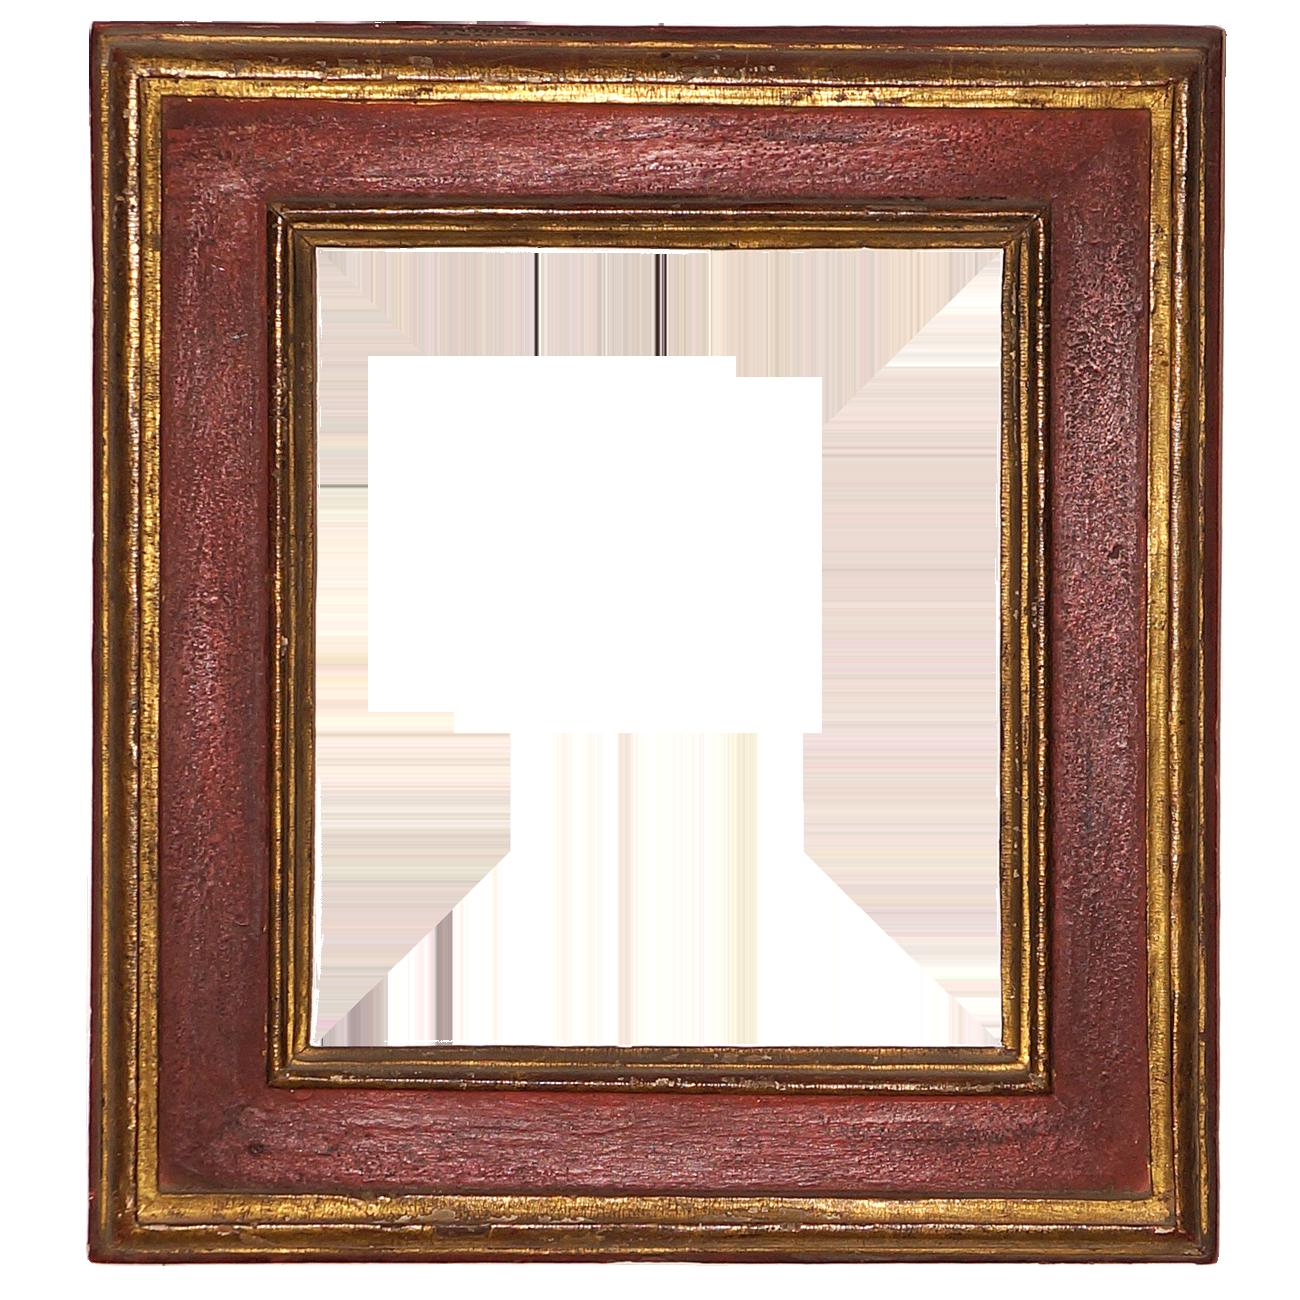 Roter Plattenrahmen - Antike Rahmen